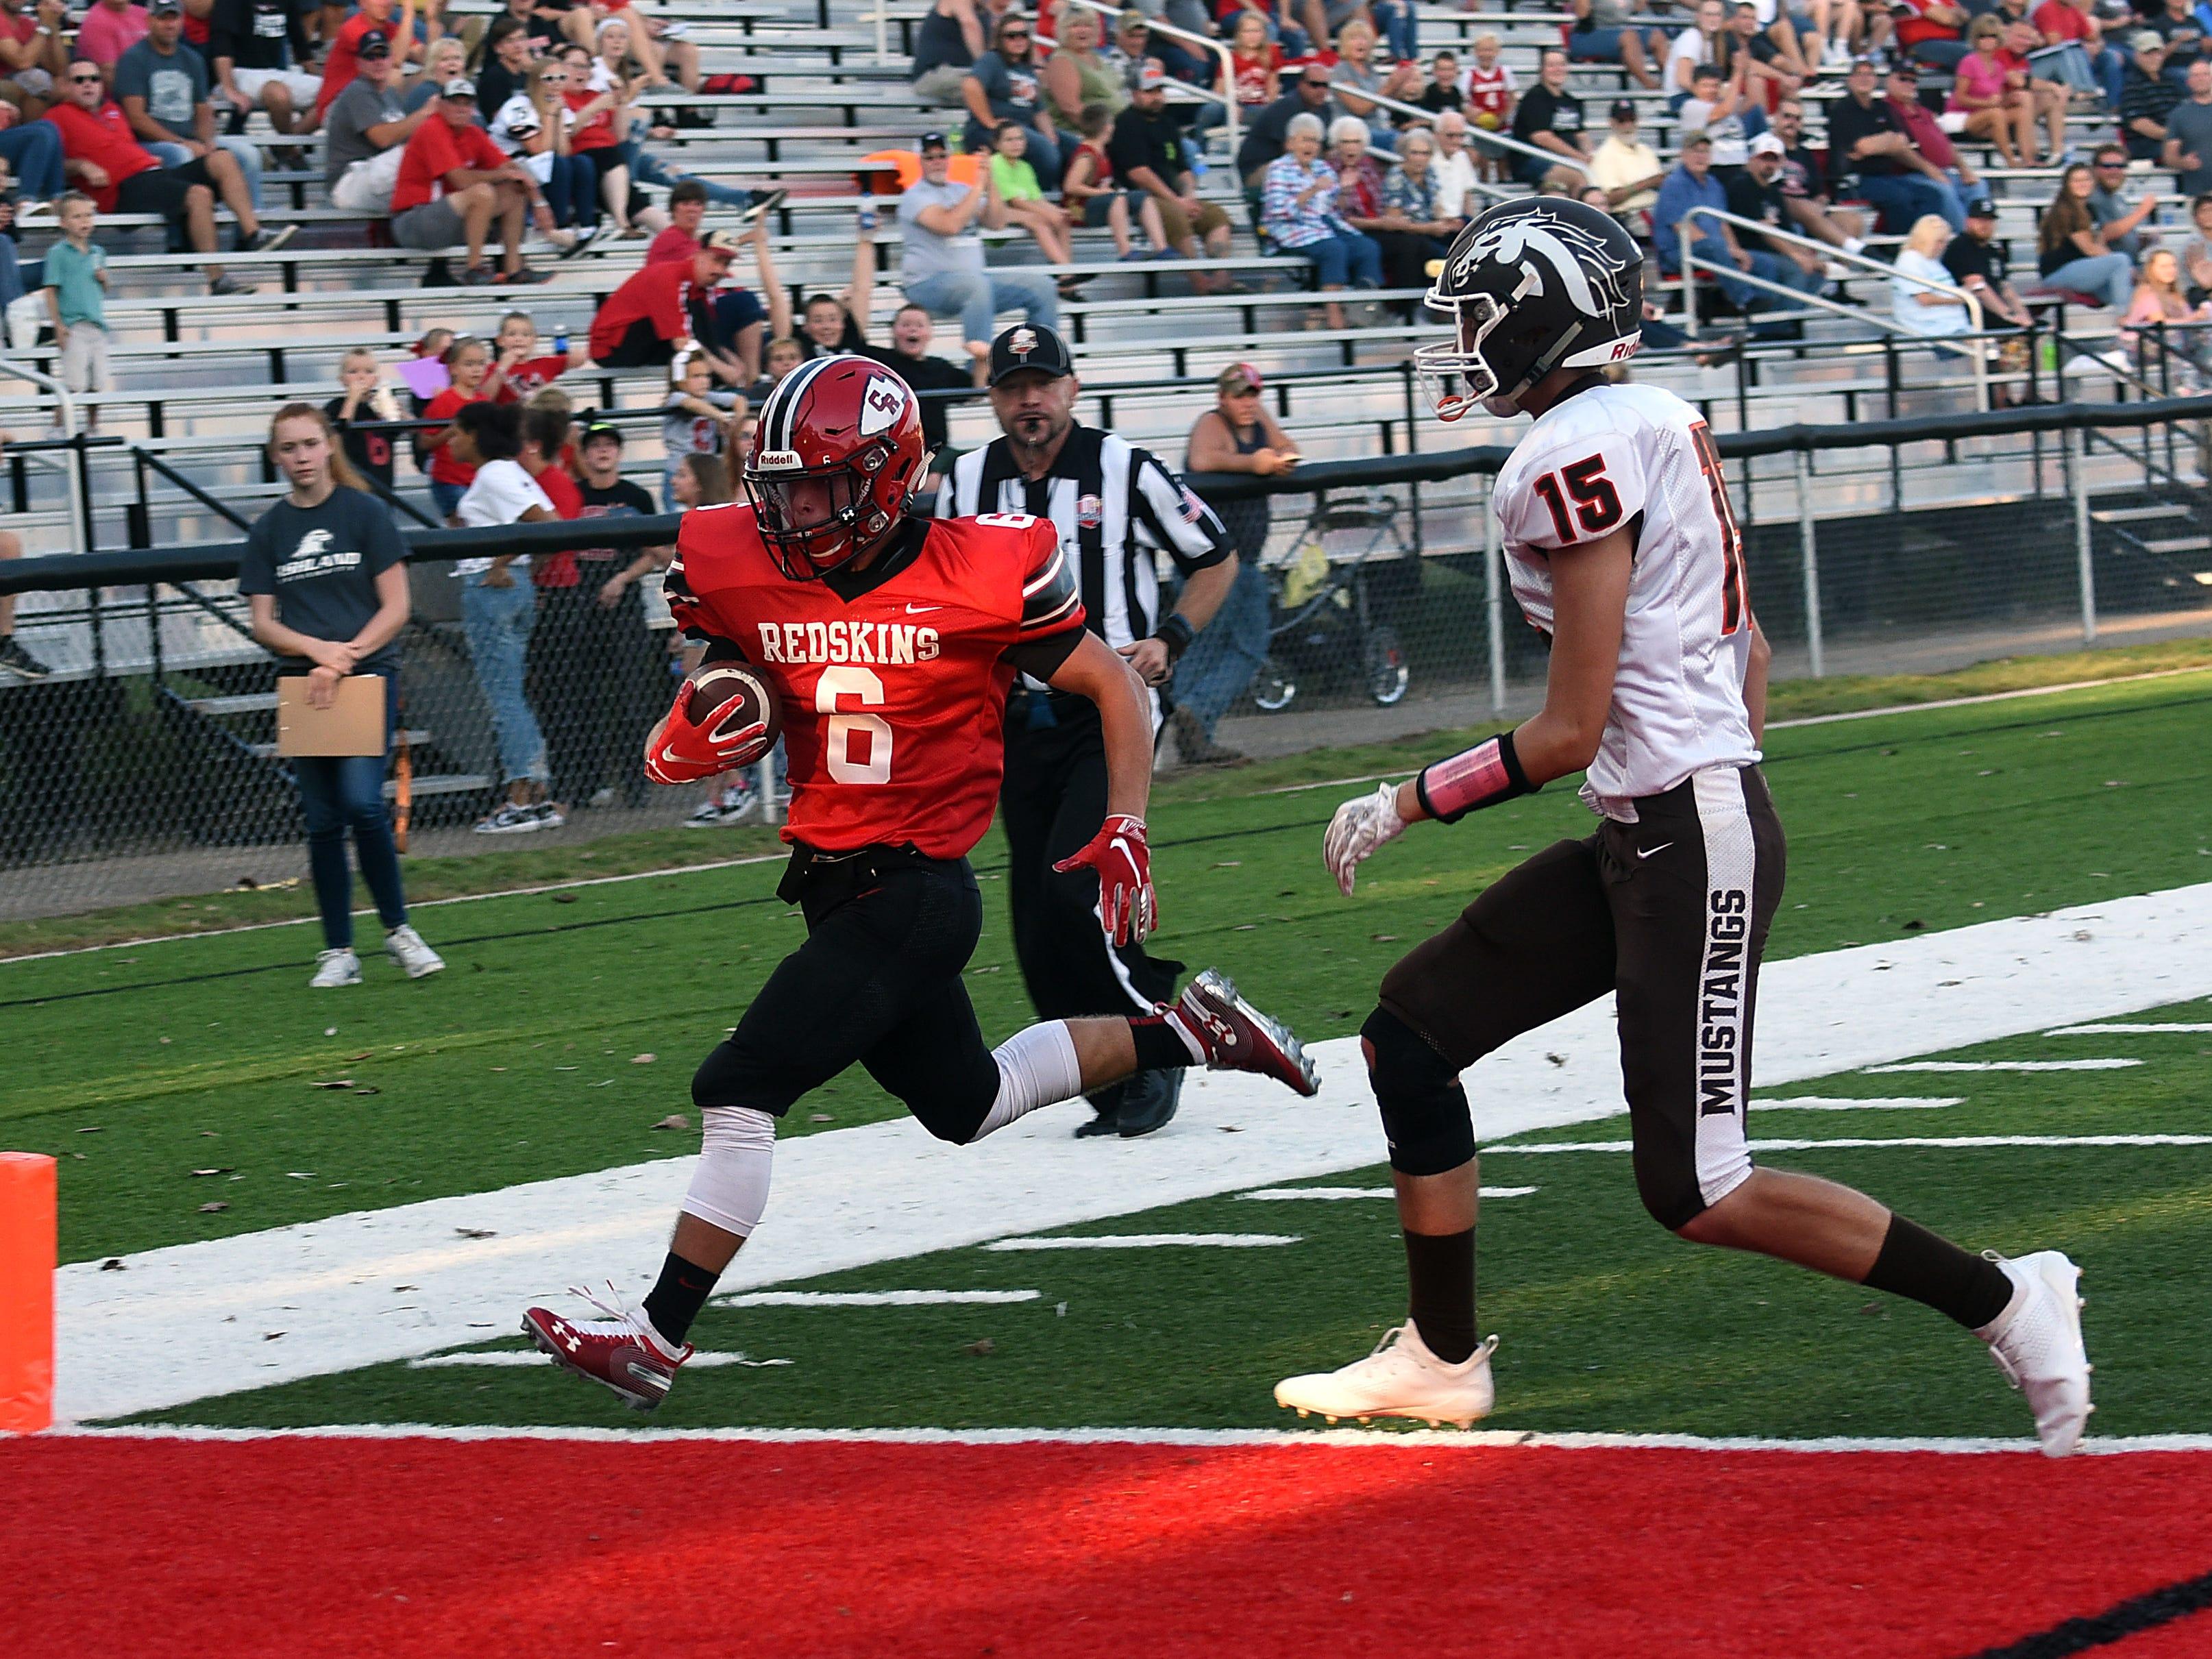 Coshcoton senior Andrew Kitten outruns Claymont defender Derek Moreland to score the first touchdown during Friday night's home opener. Coshocton won 42-6.